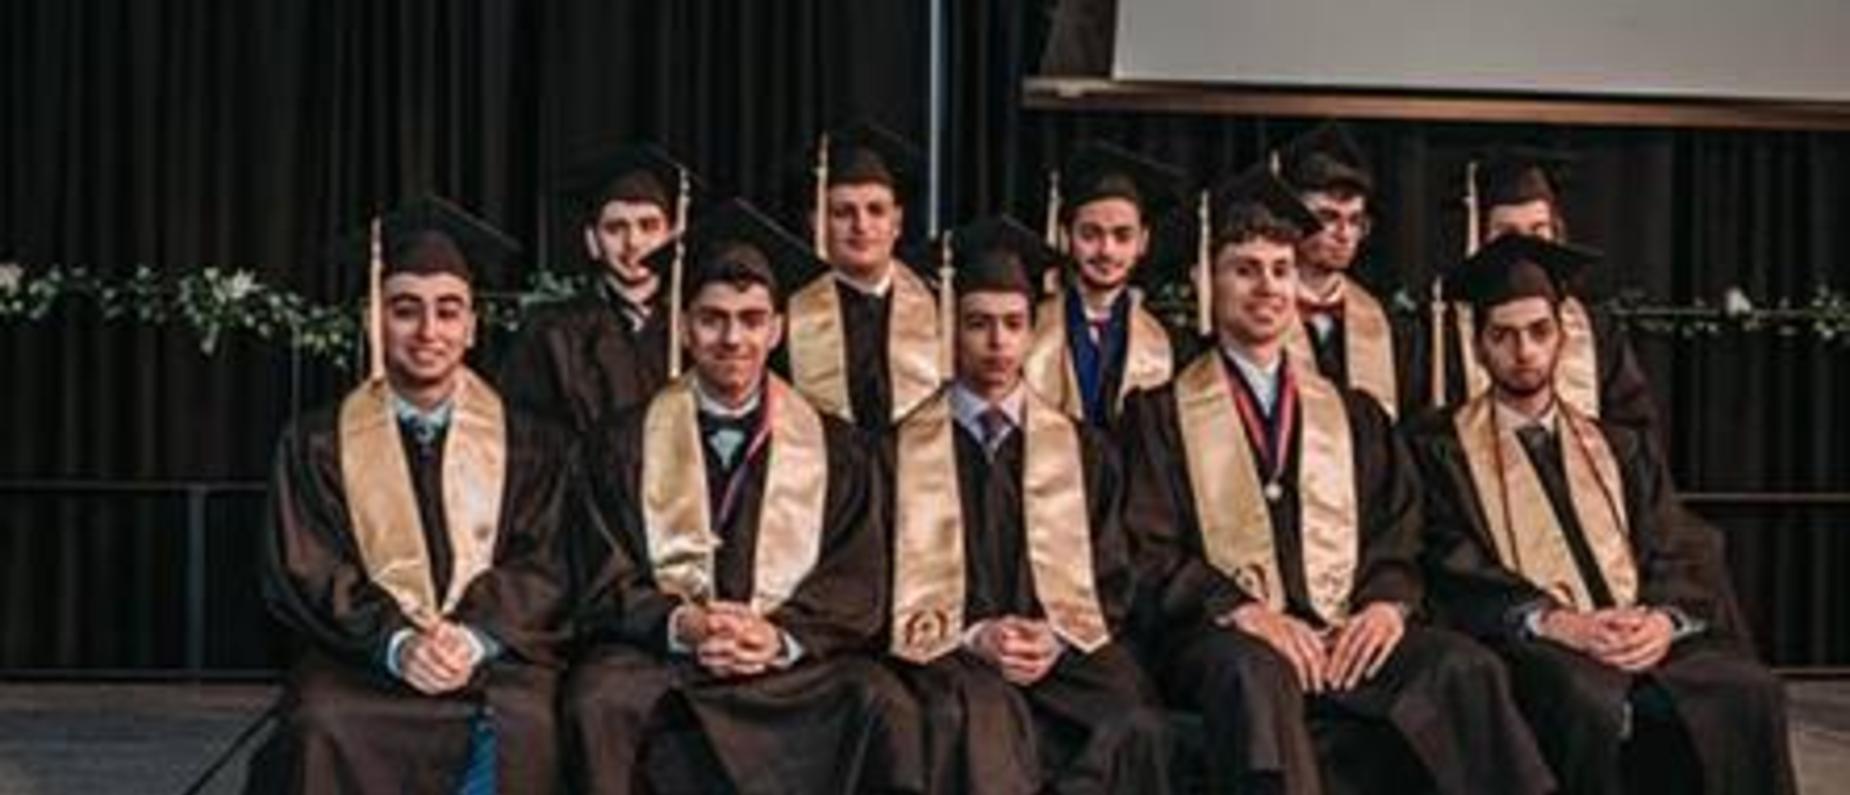 senior boys 19